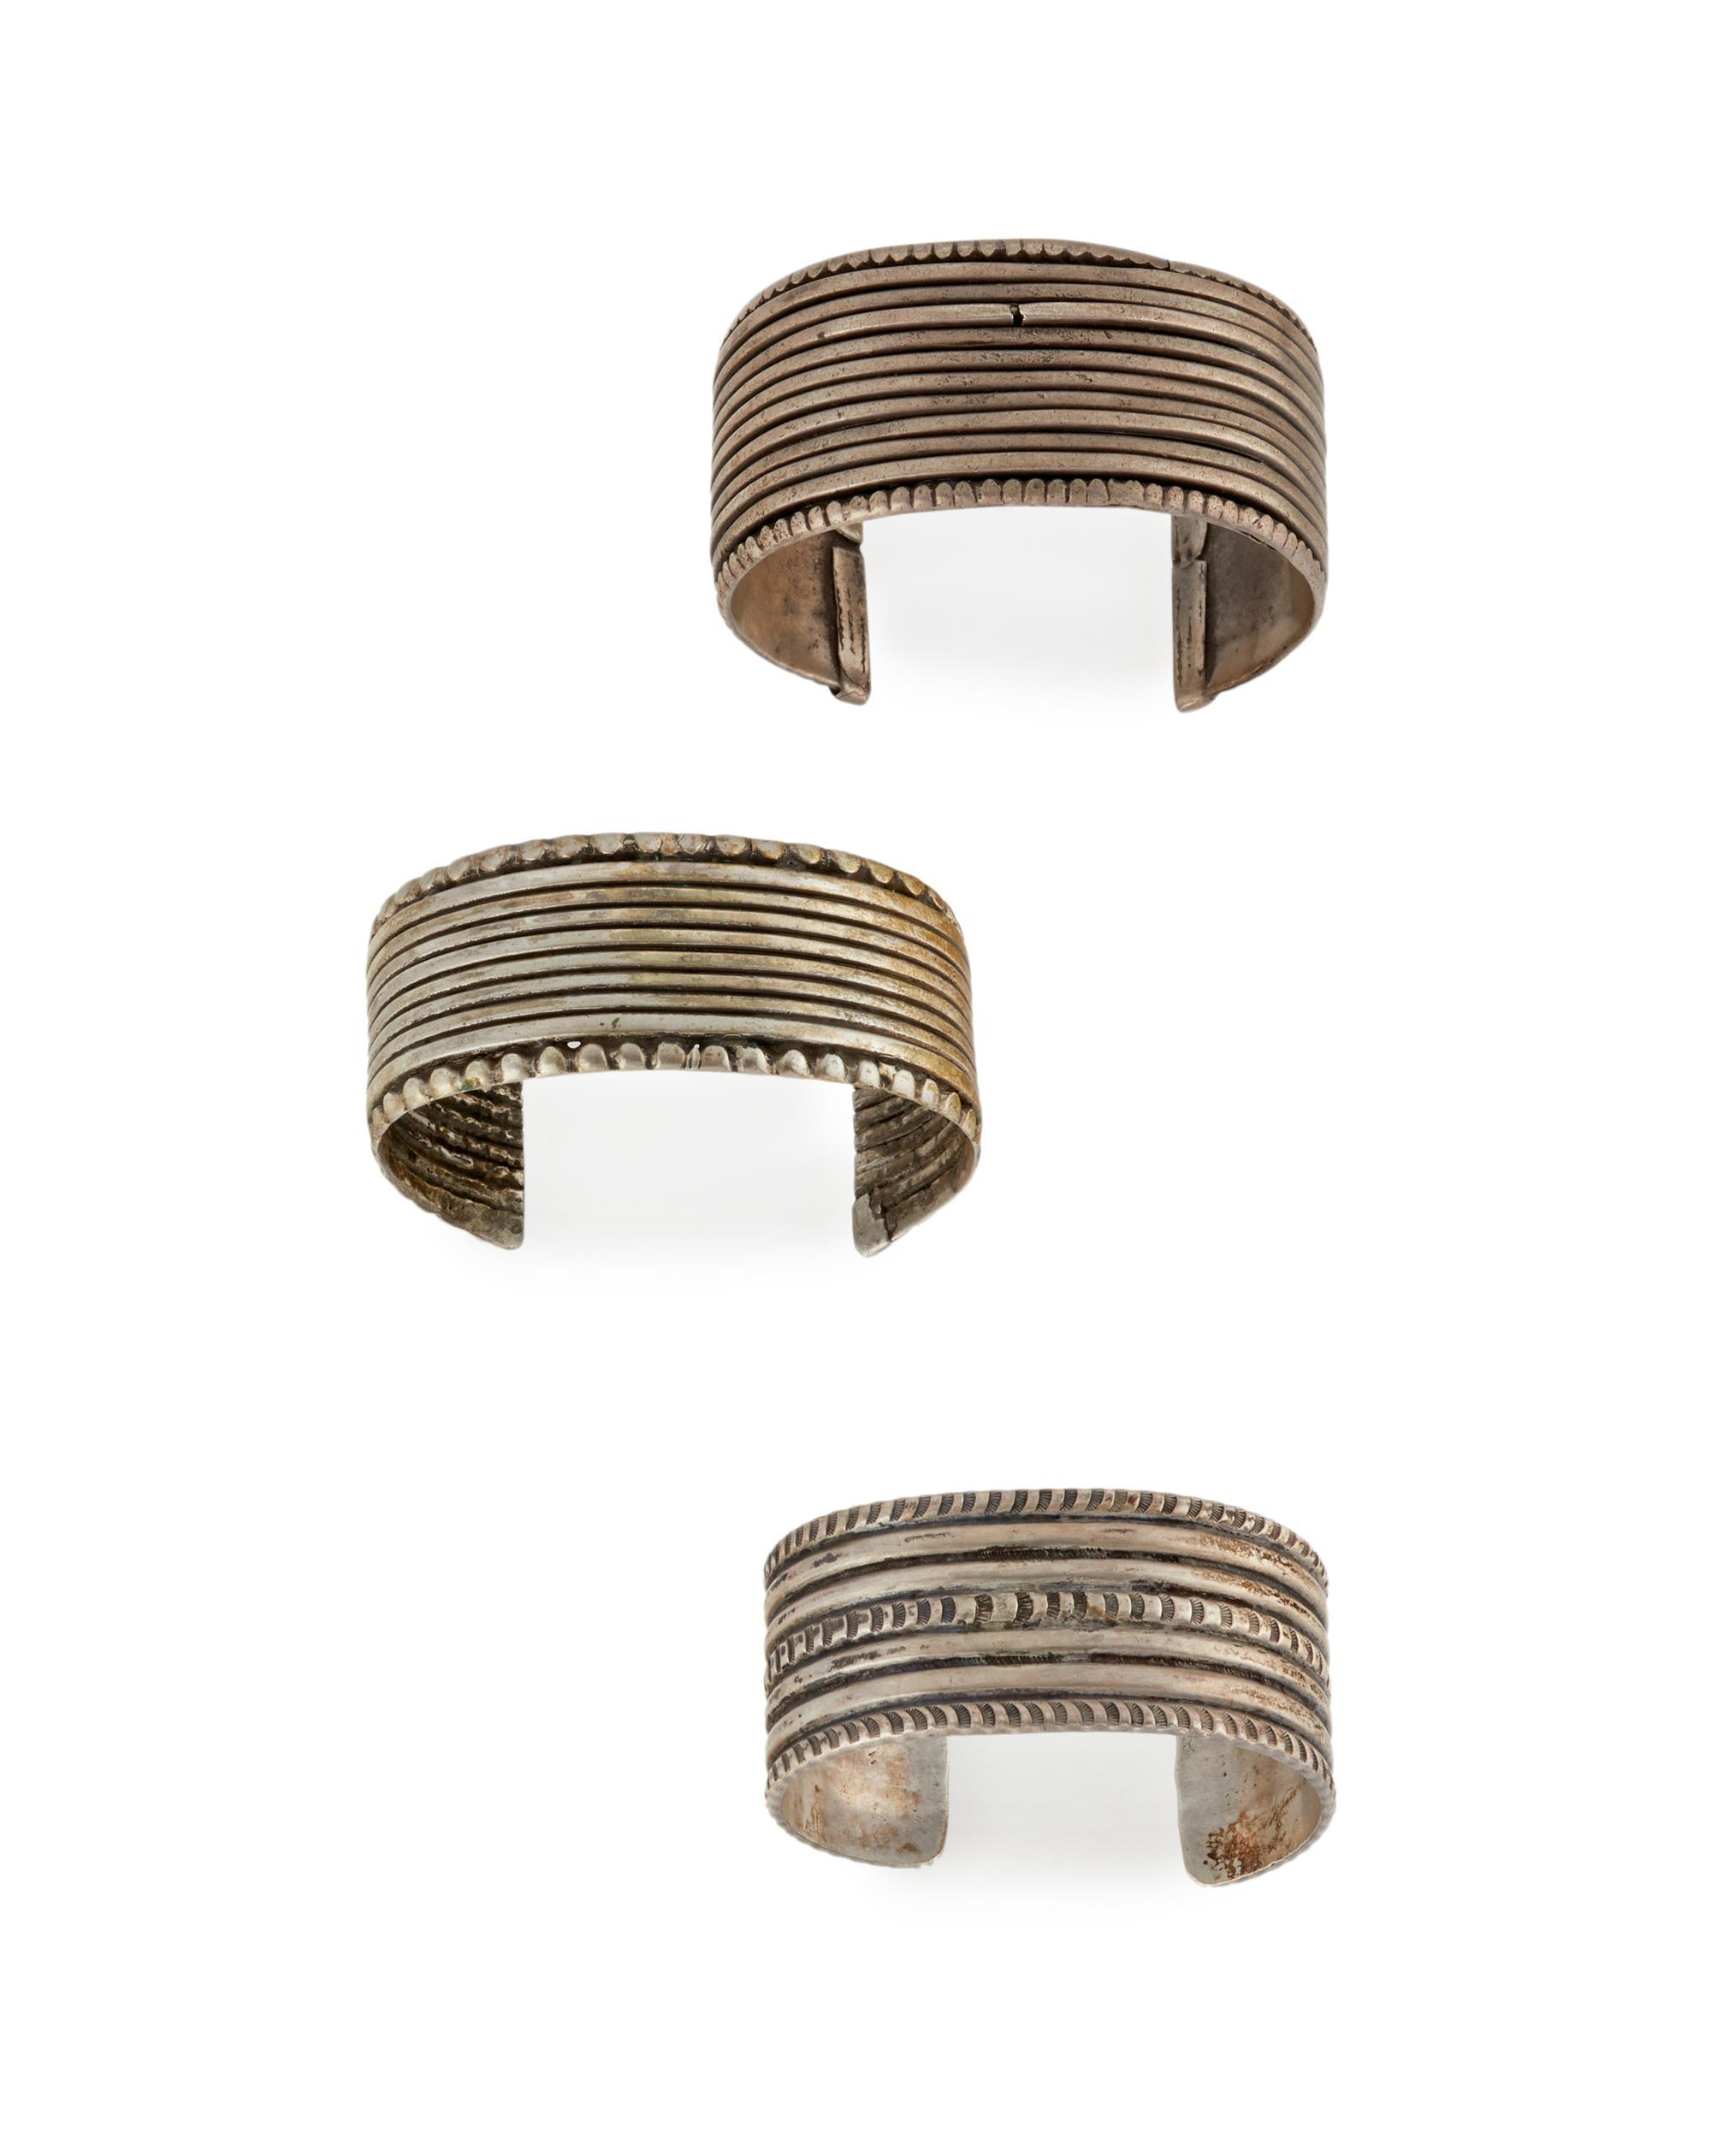 Three silver cuff bracelets